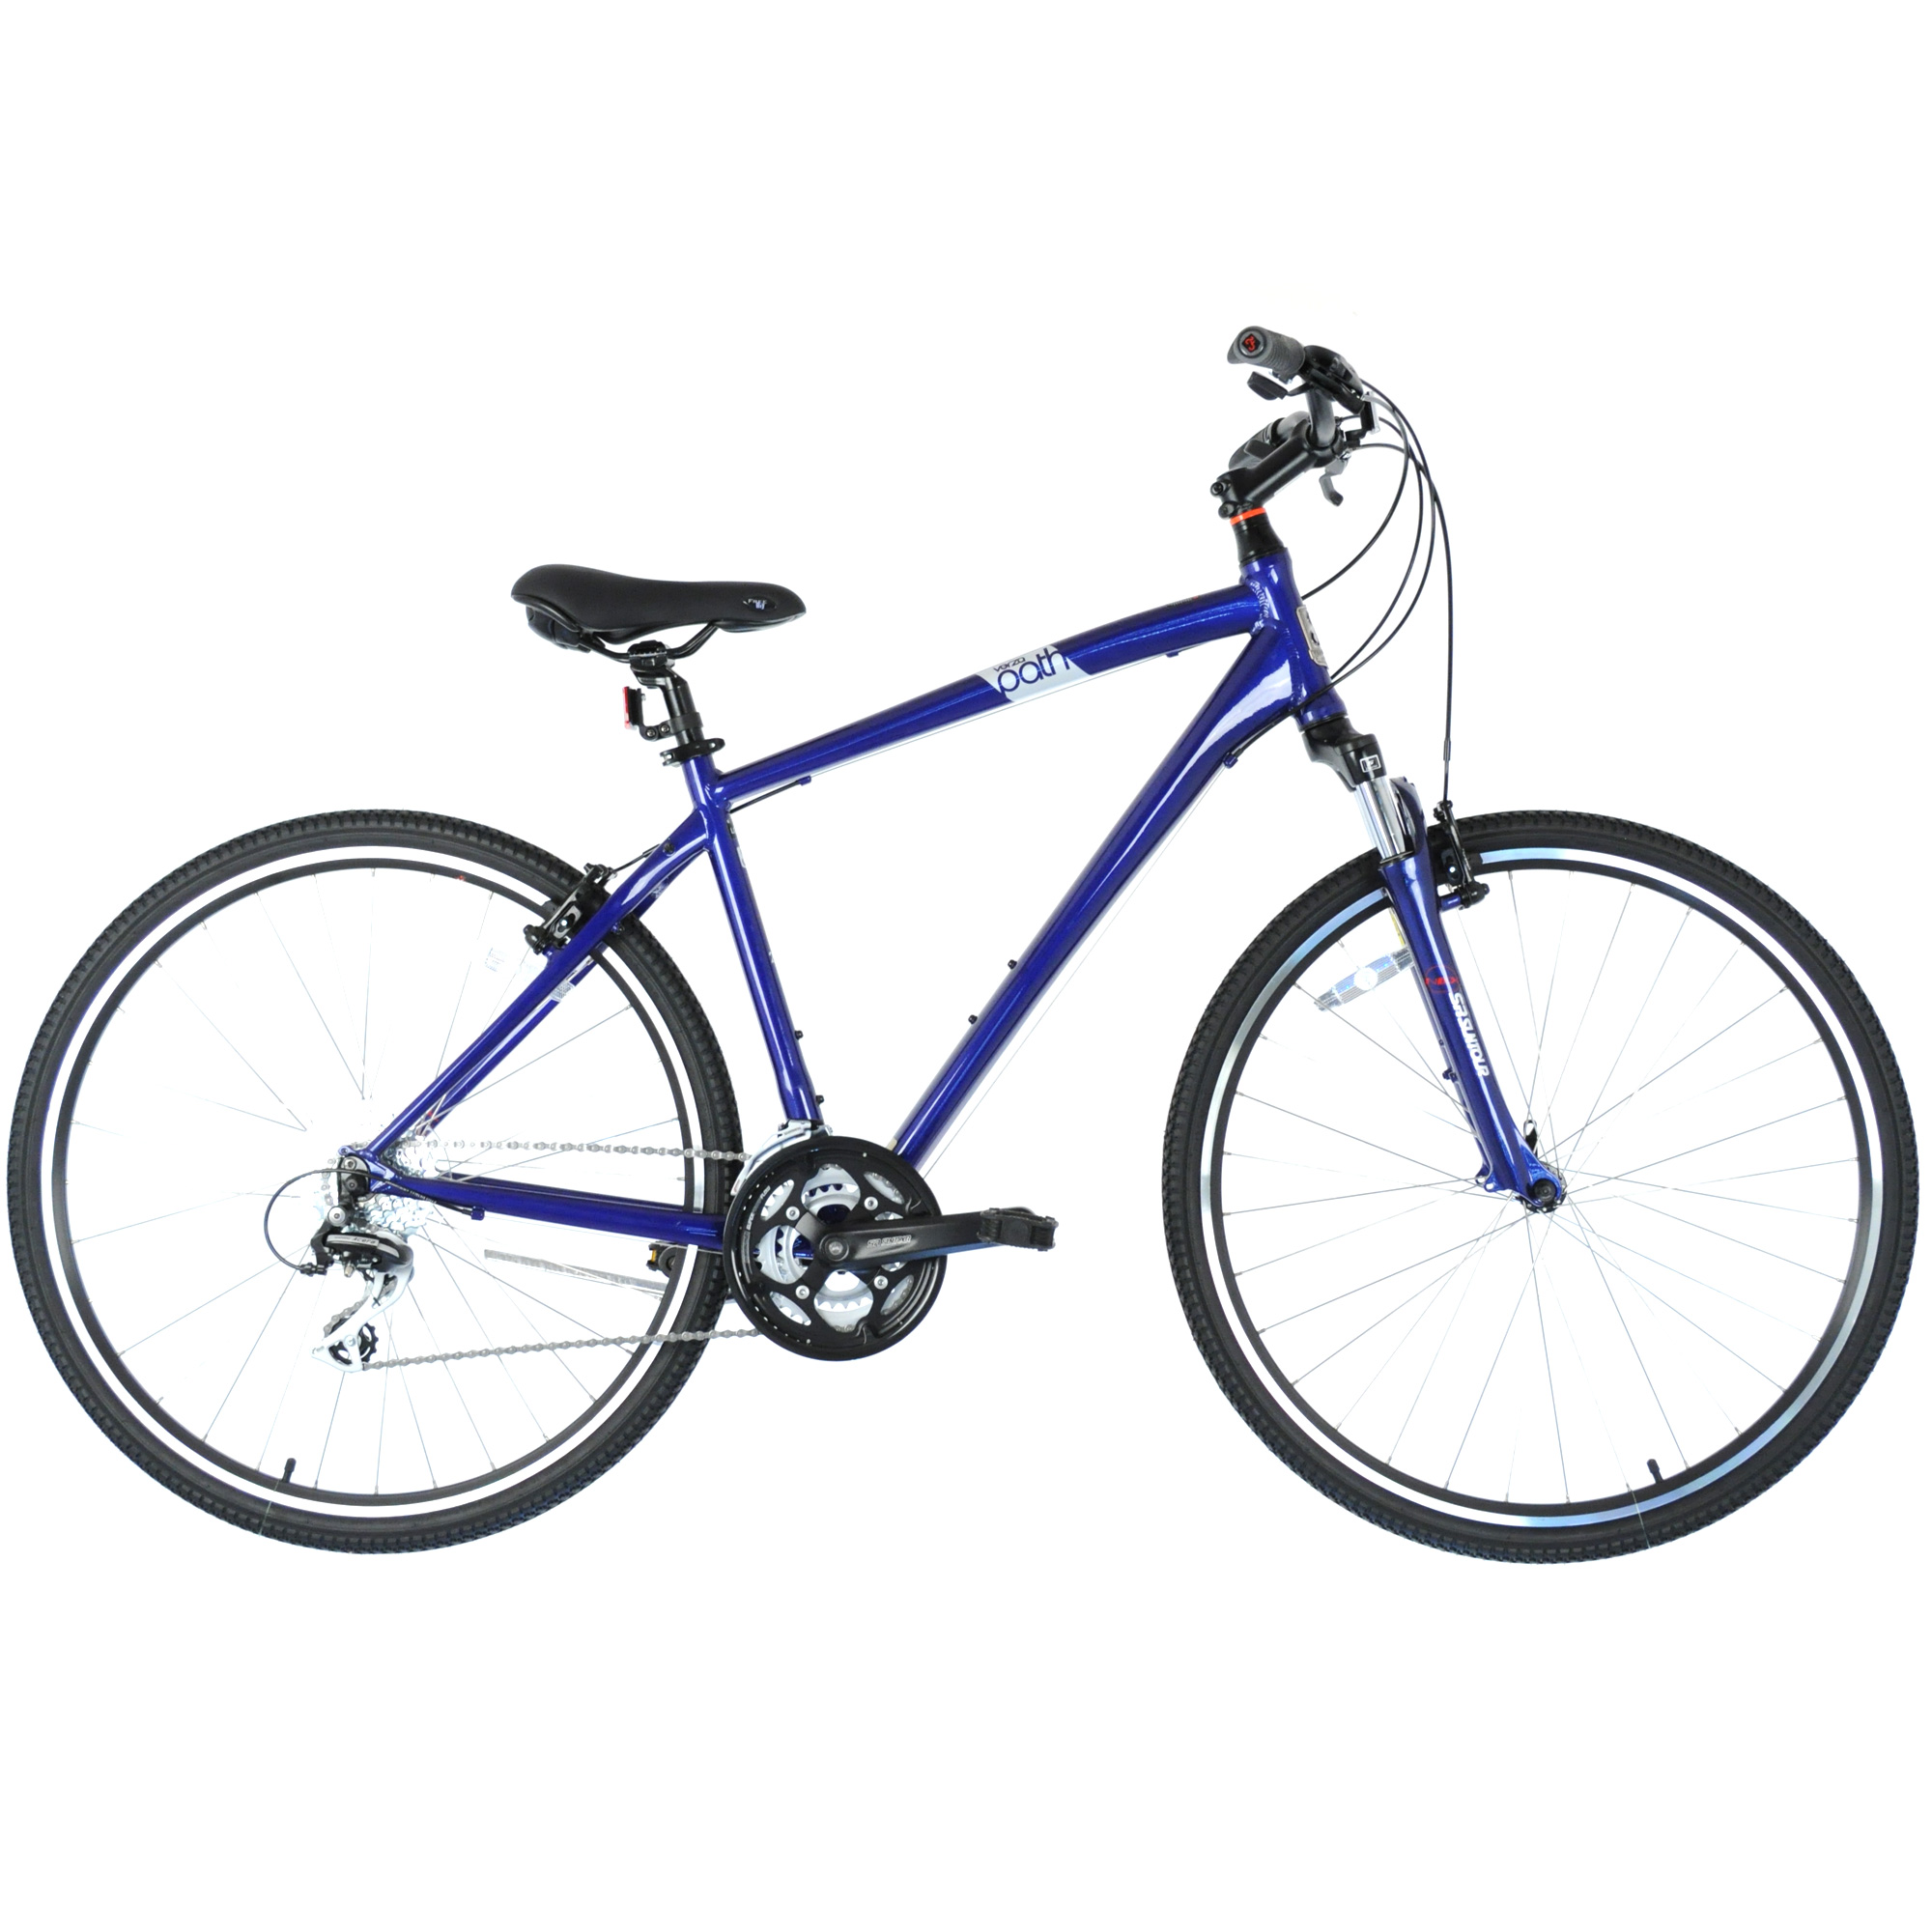 "2016 FELT Verza Path 20 Upright Hybrid Fitness Bike 3x8-Speed // Blue // 20"""